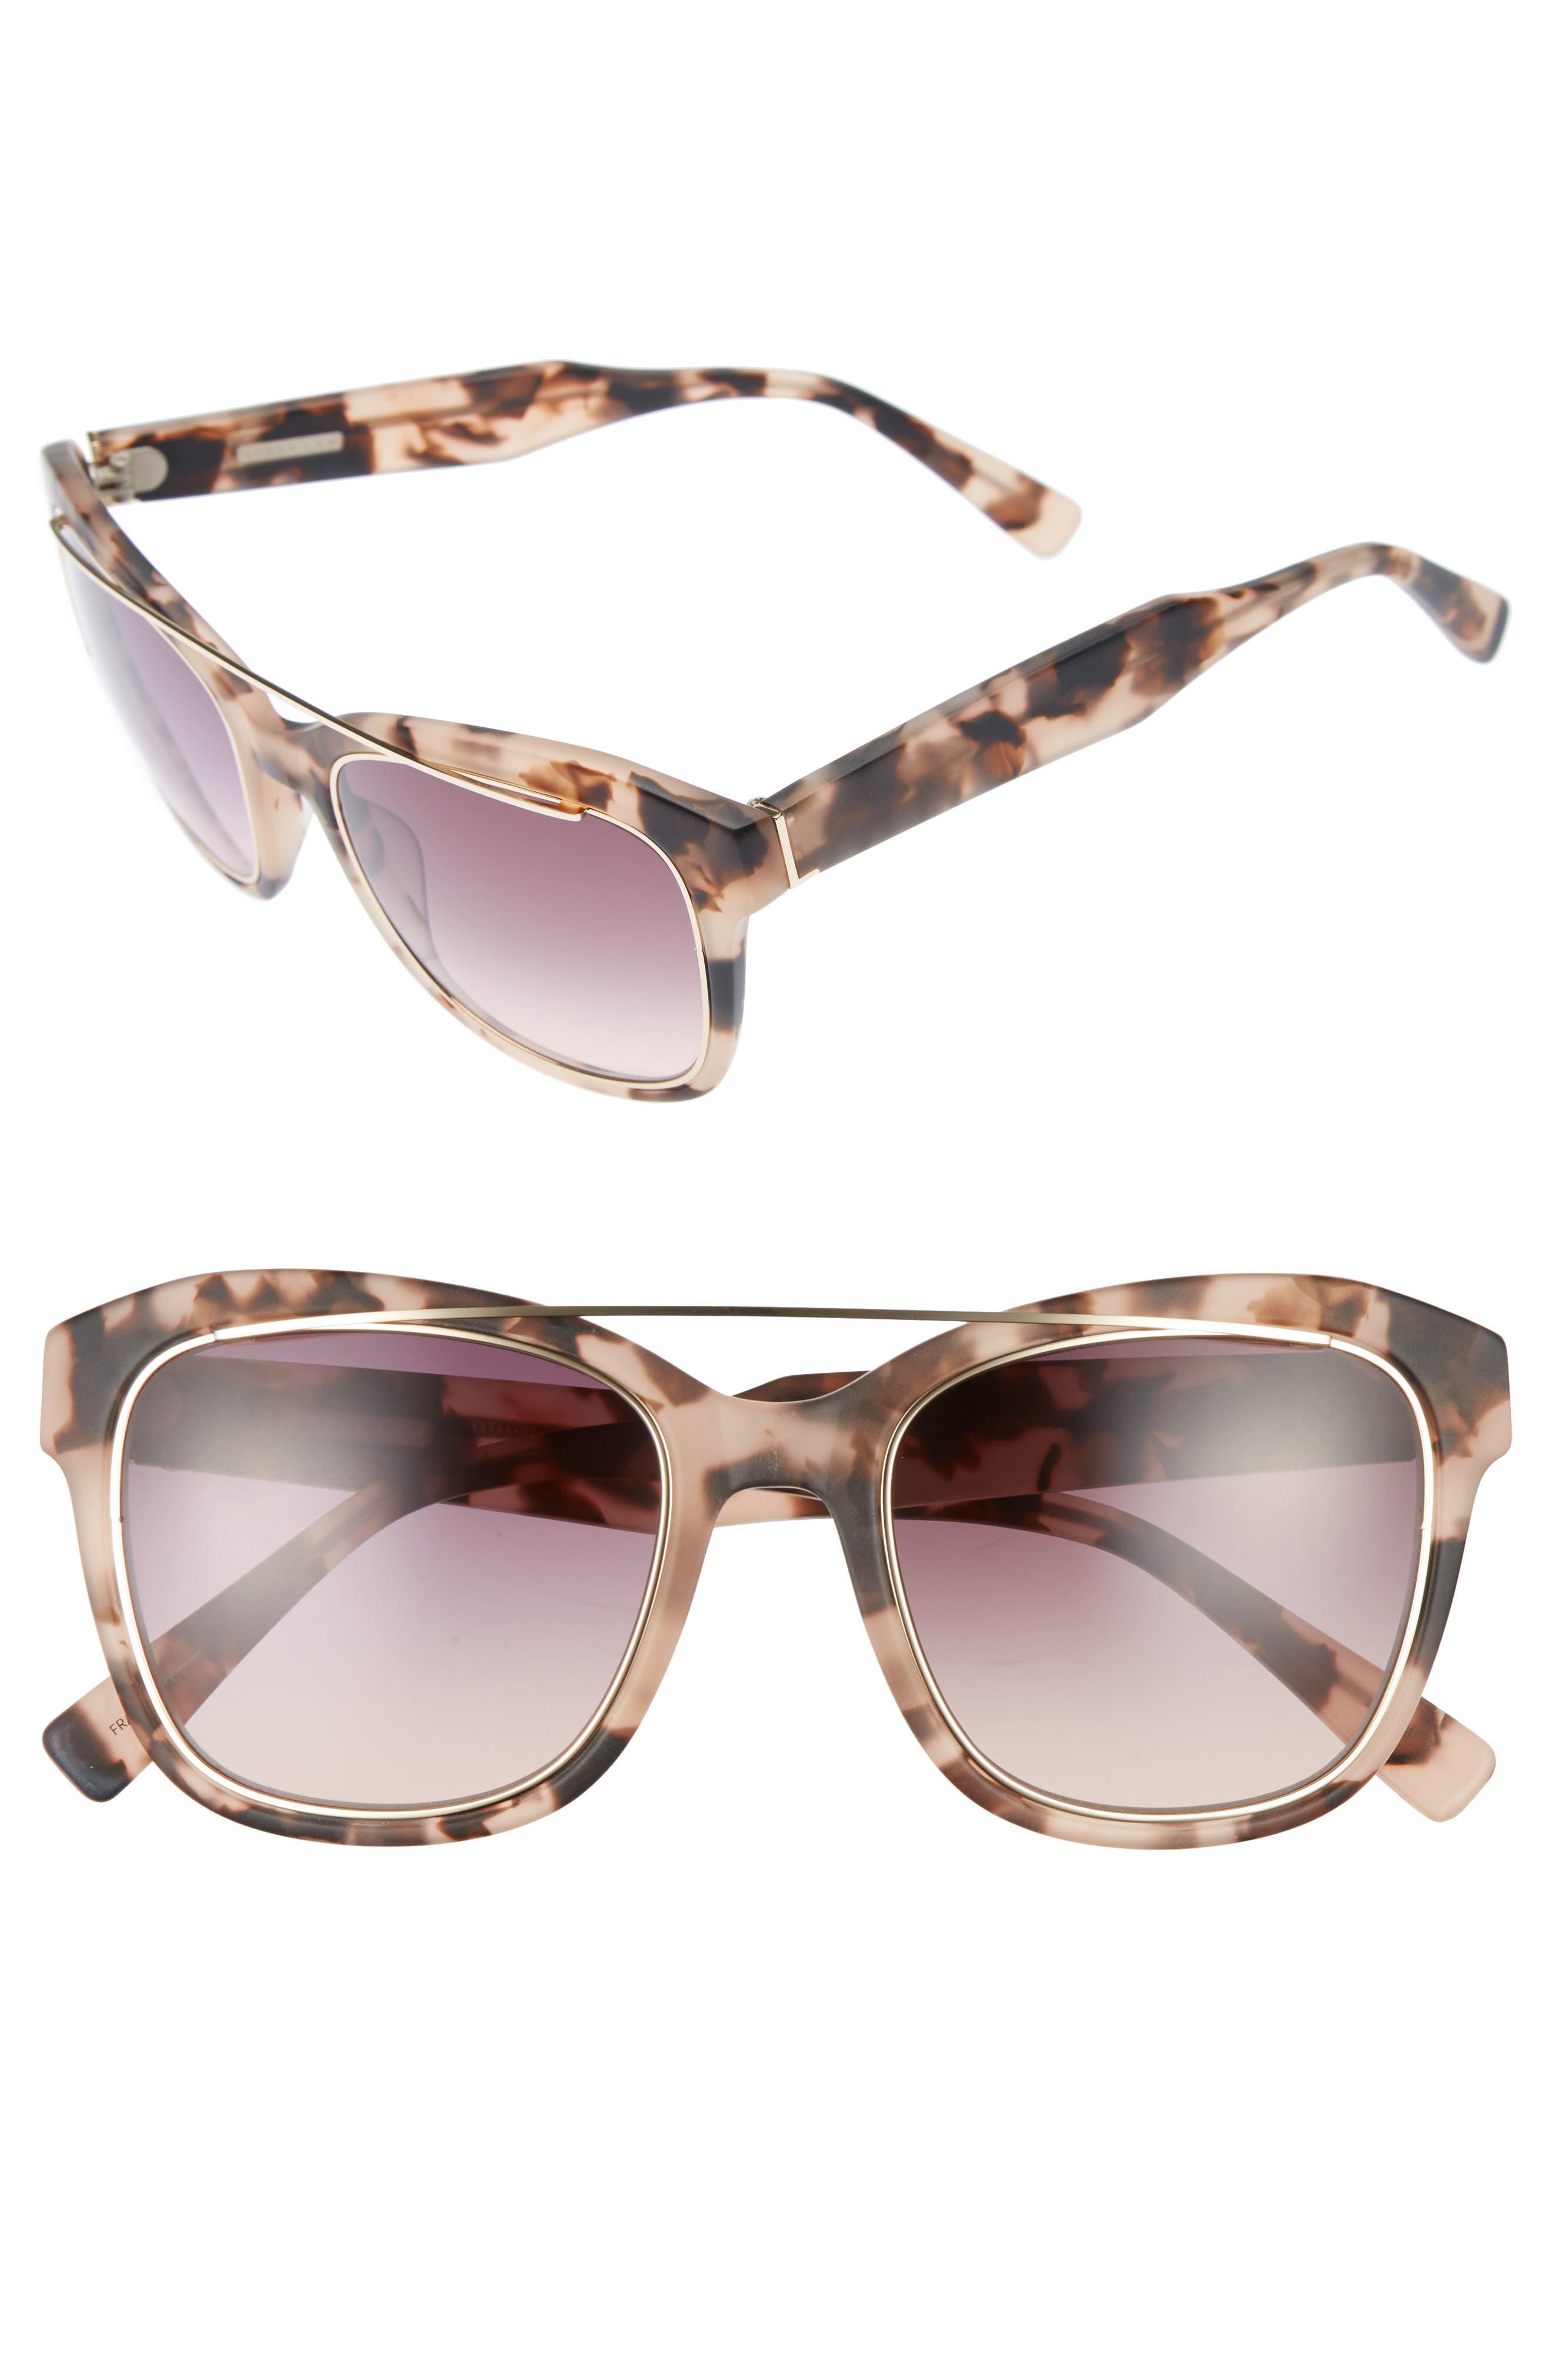 Alternate Image 1 Selected - Derek Lam Hudson 52mm Gradient Sunglasses